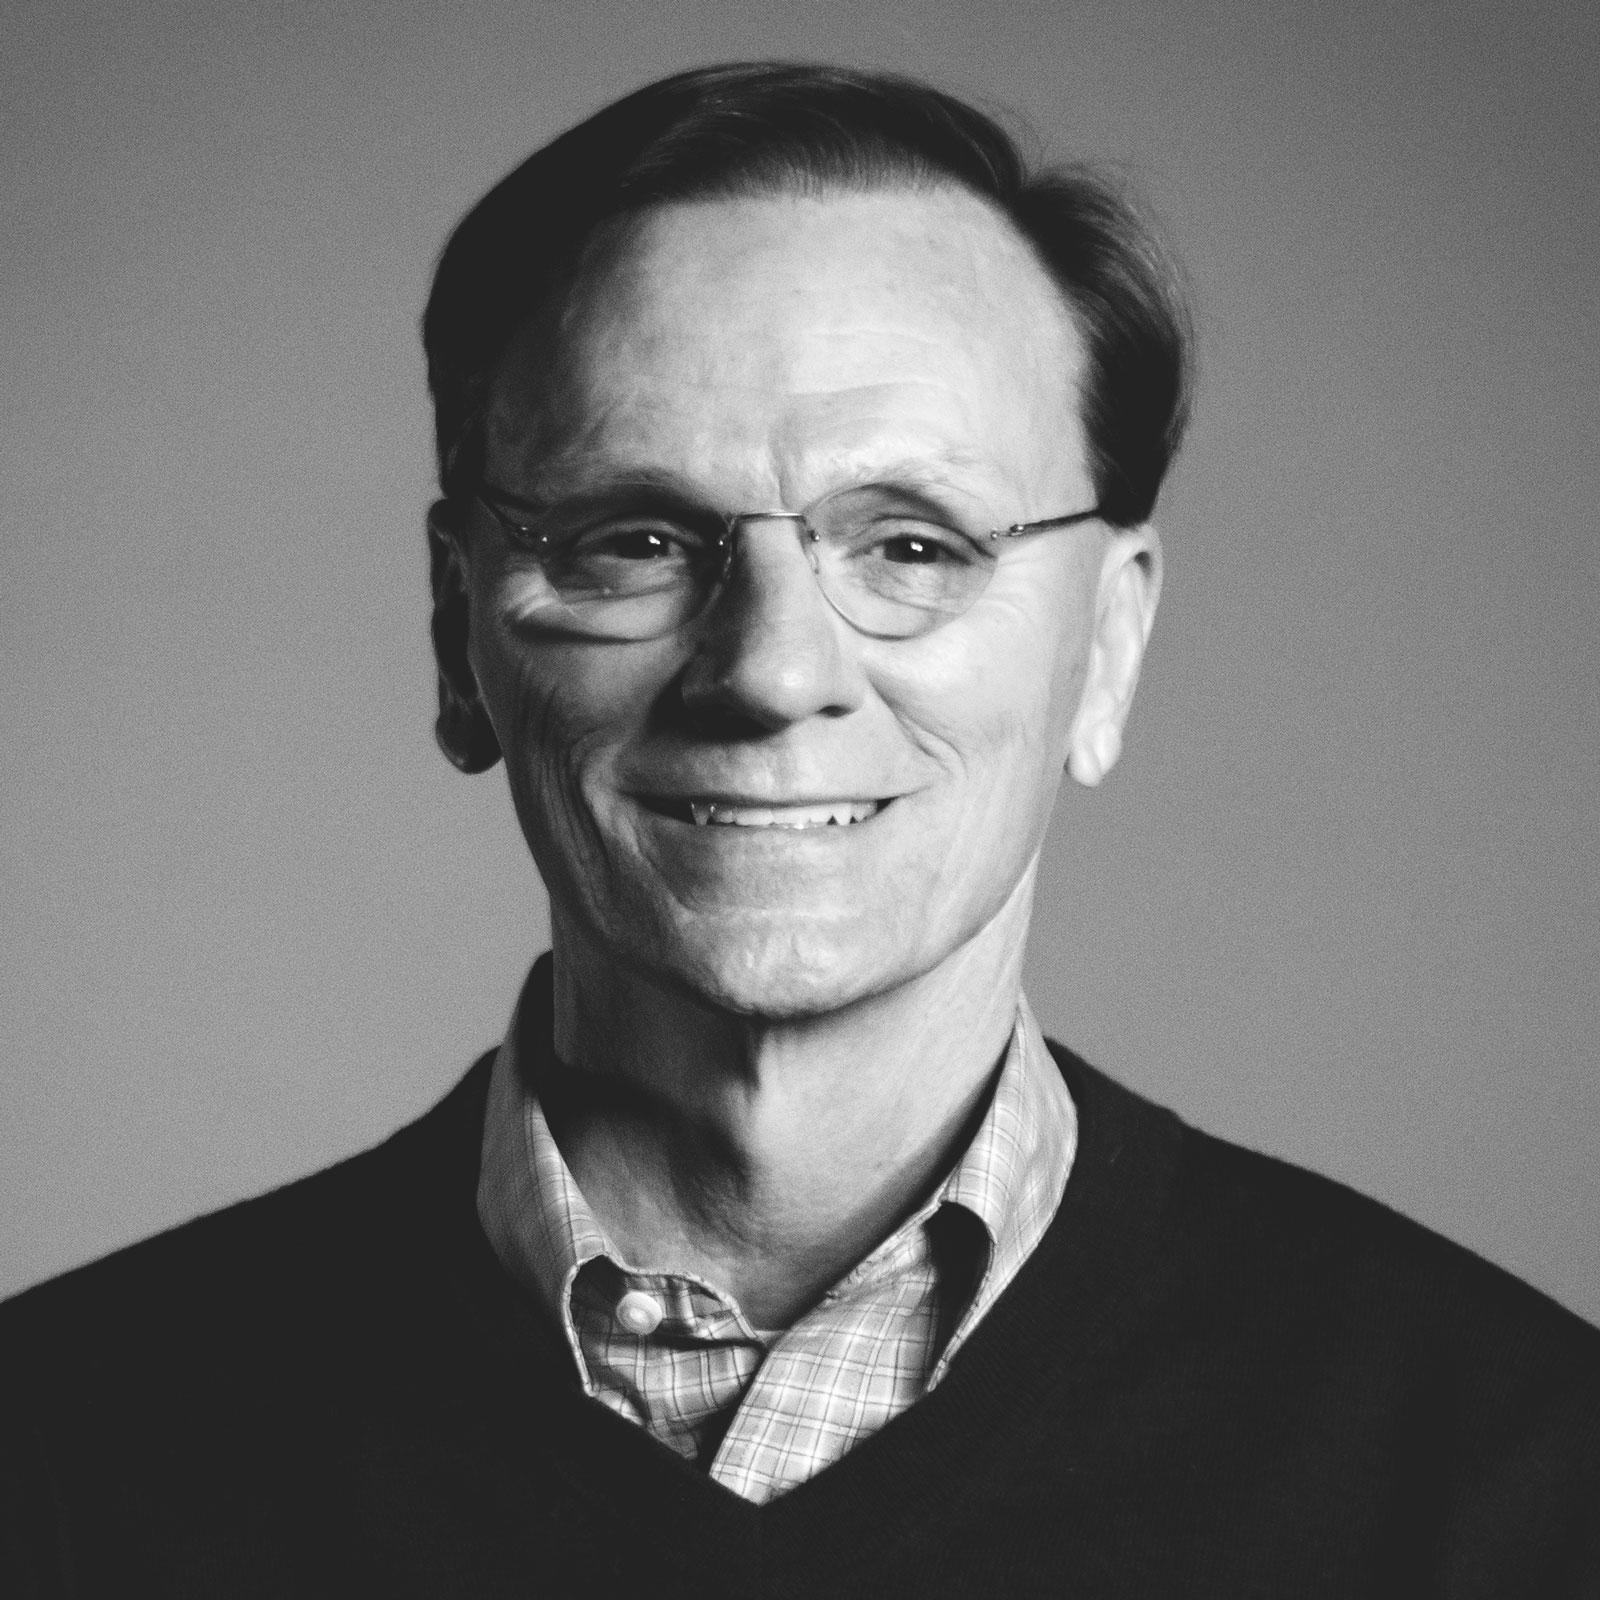 "<a href=""https://christianstandard.com/author/chrisphilbeck/"" target=""_self"">Chris Philbeck</a>"